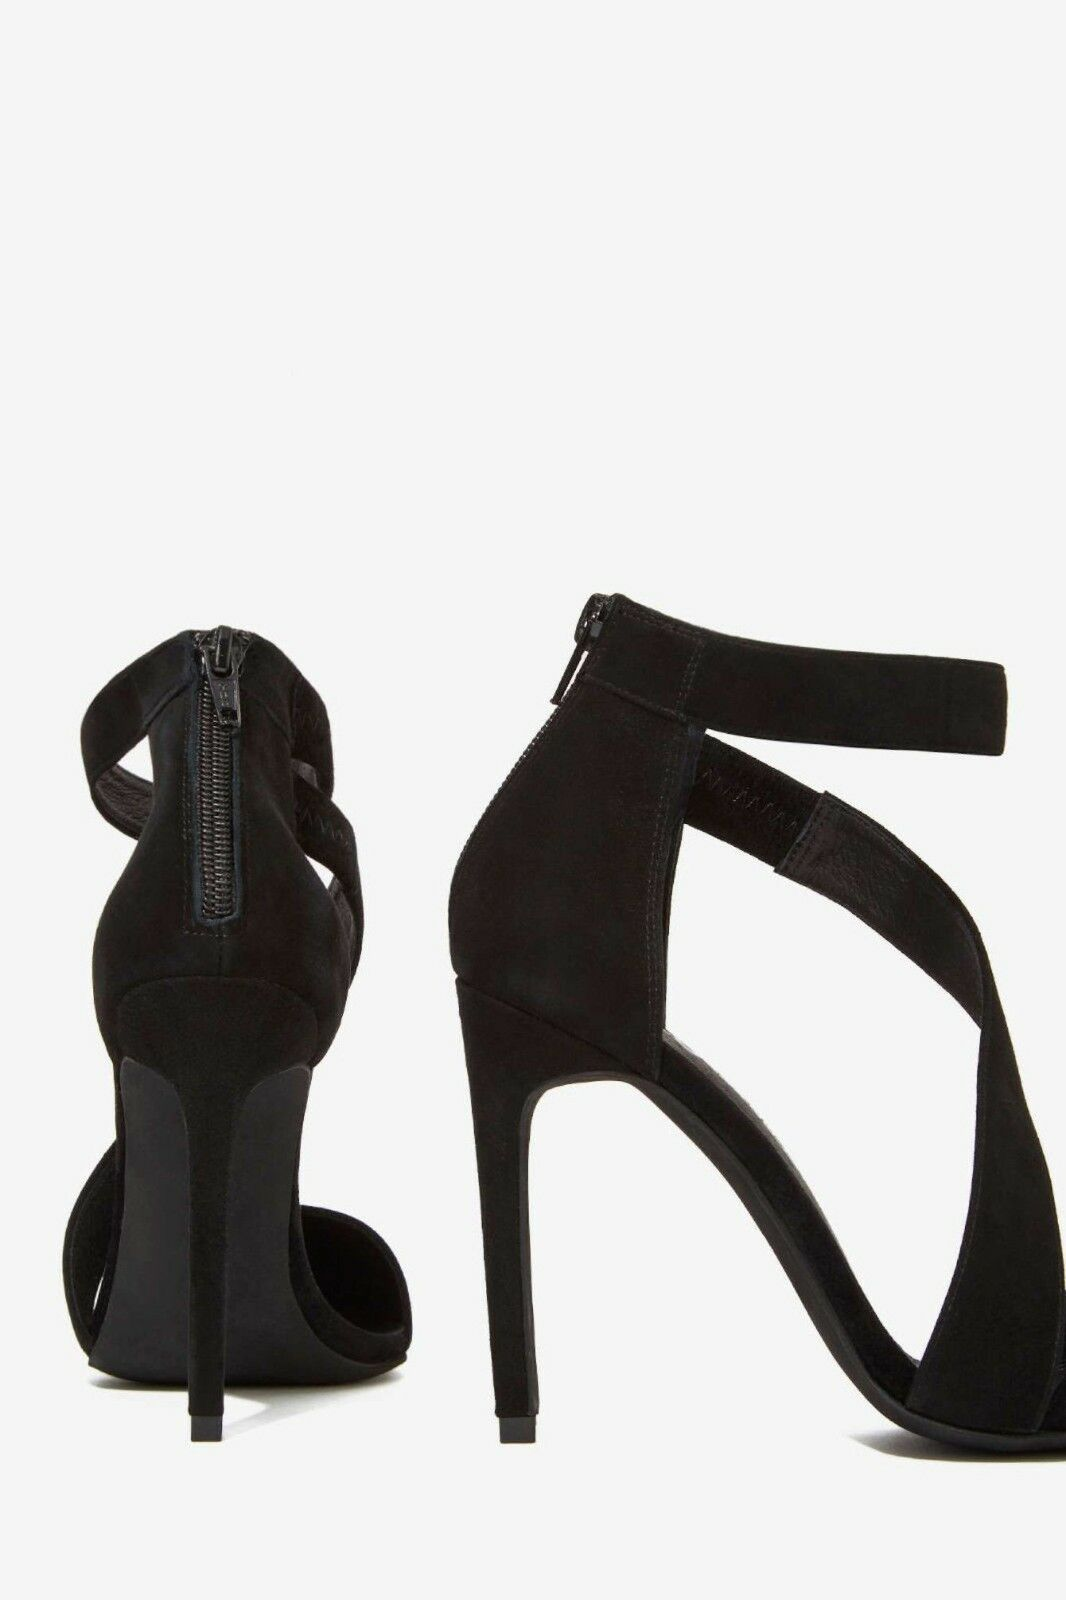 Jeffrey Campbell Septiva Black Suede Heels Pump Exclusively 4 Nasty Nasty Nasty Gal  145   7 24ed85